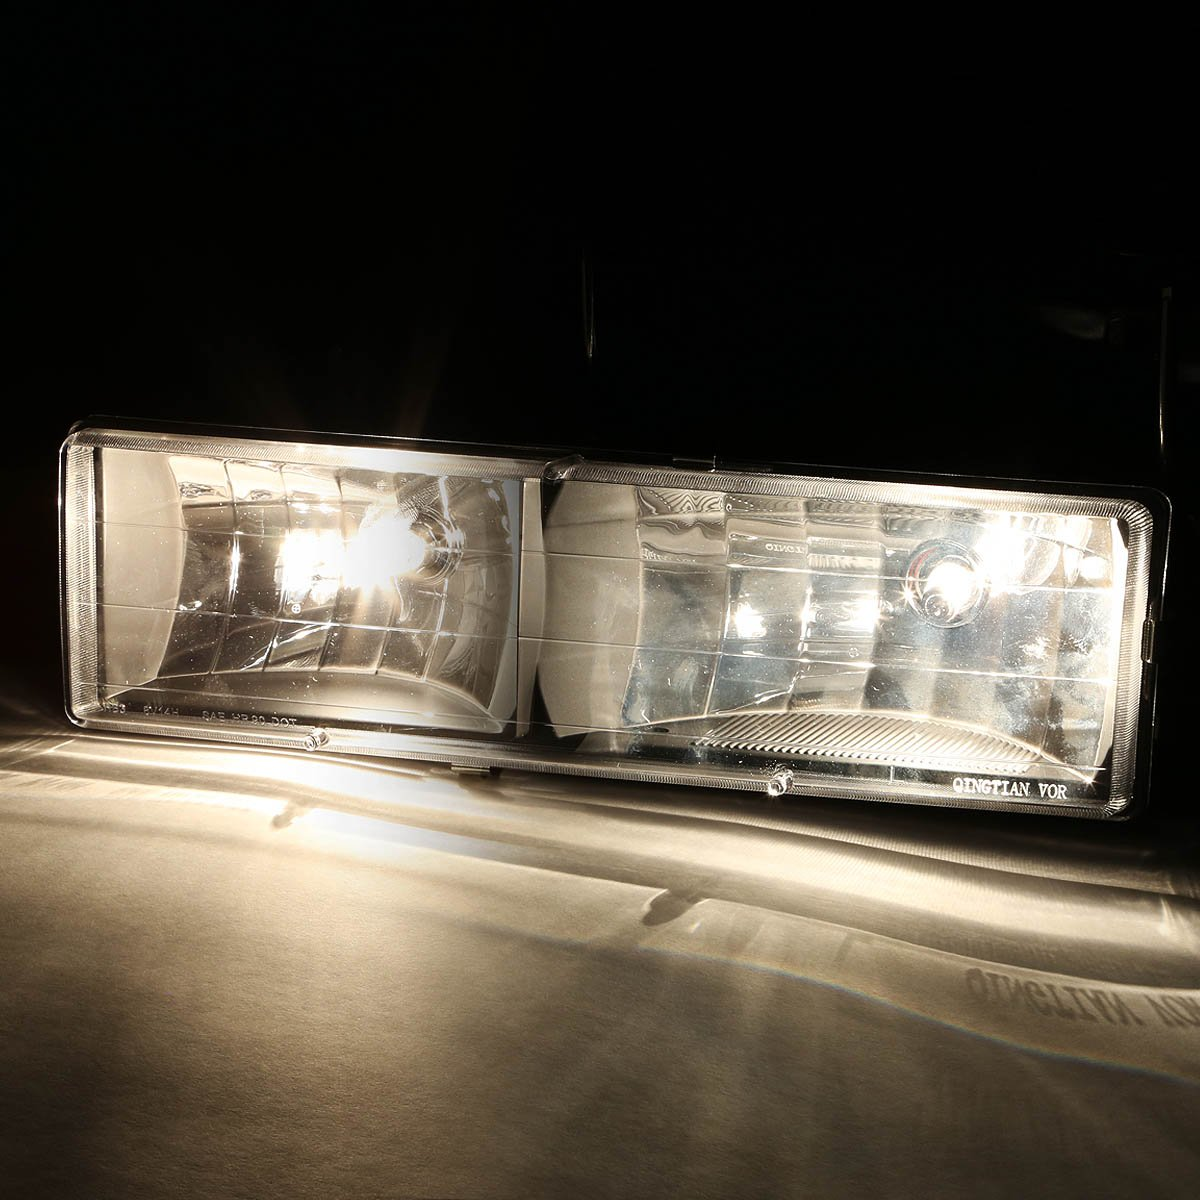 DNA MOTORING HL-OH-8P-C1094-BK-AM Headlight Assembly